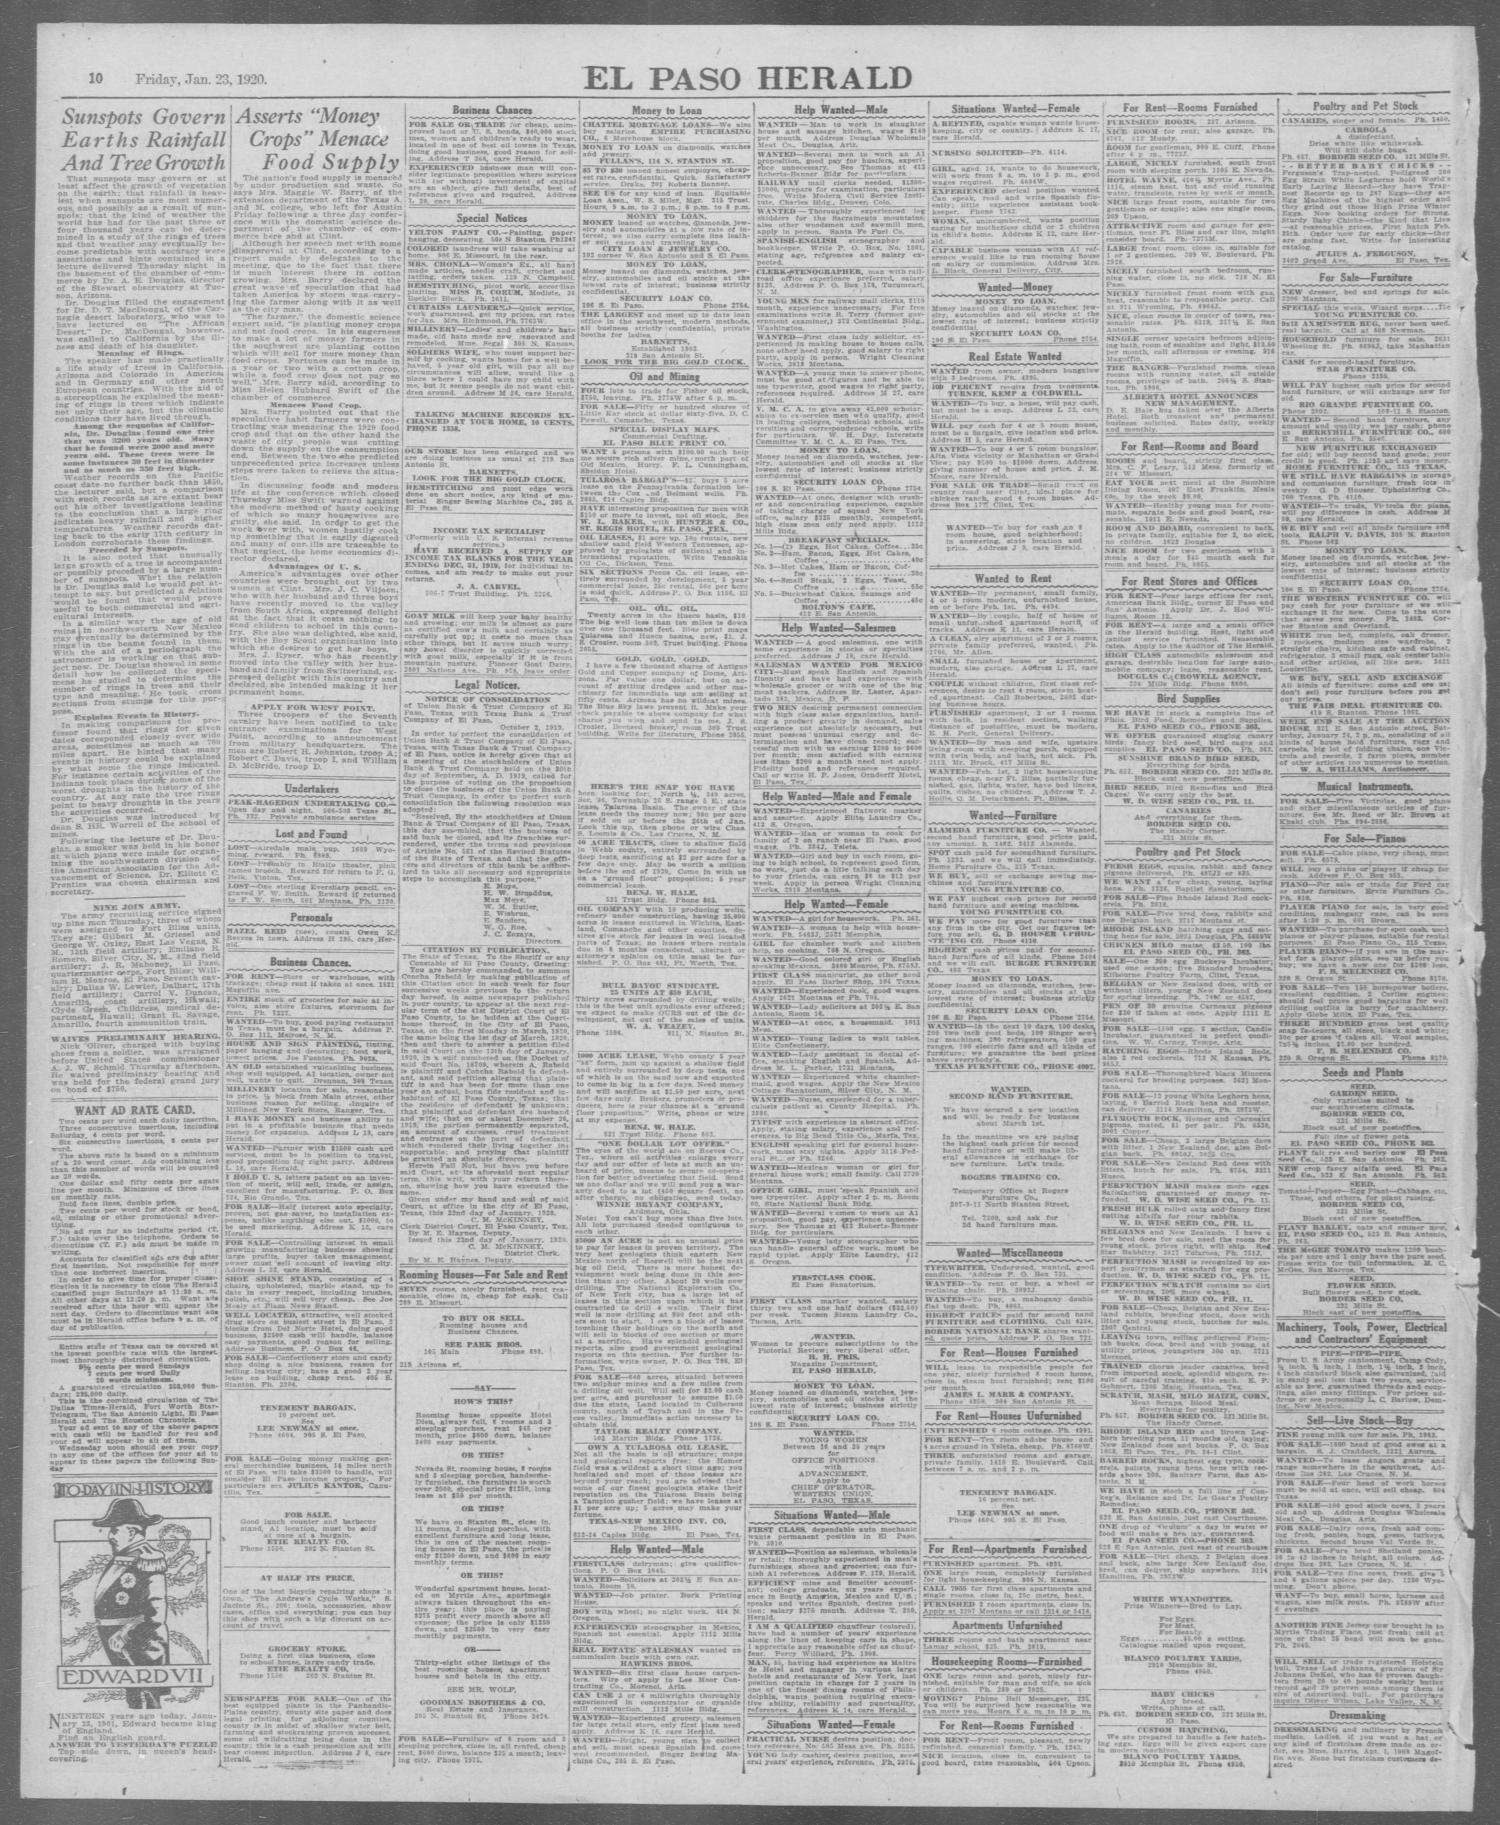 El Paso Herald El Paso Tex Ed 1 Friday January 23 1920 Page 10 of 12 The Portal to Texas History